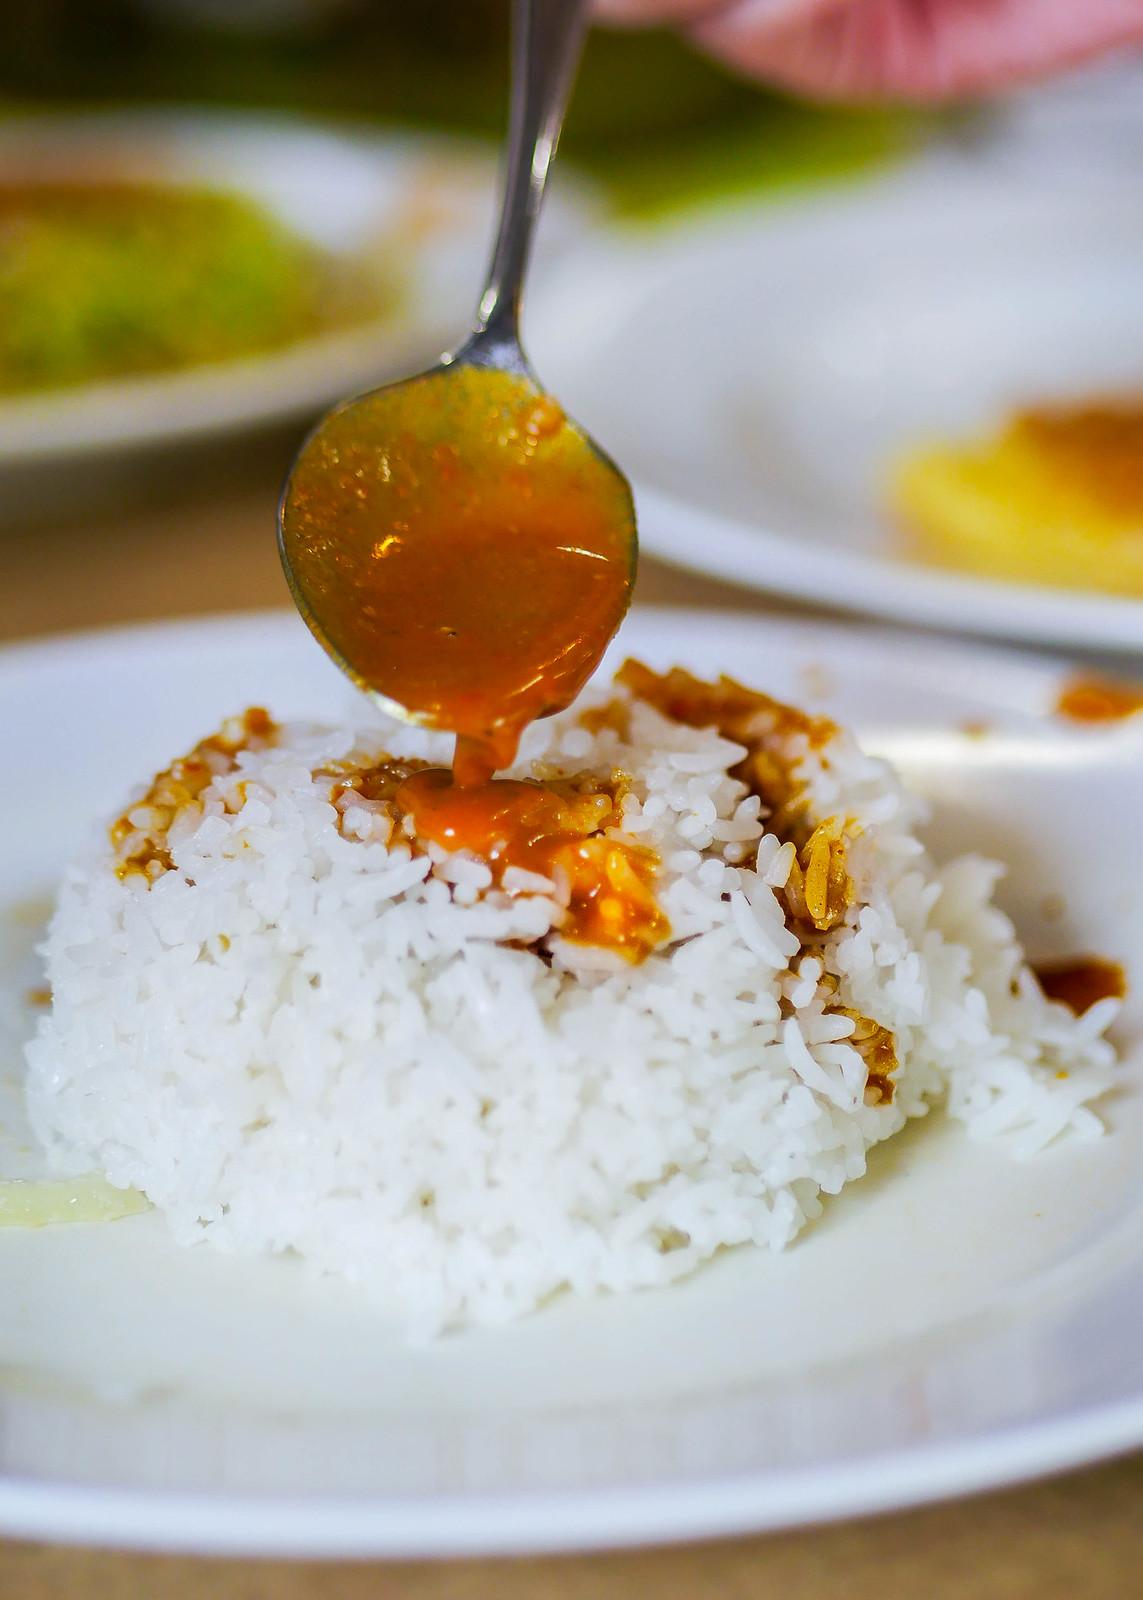 咖喱&咖喱-12